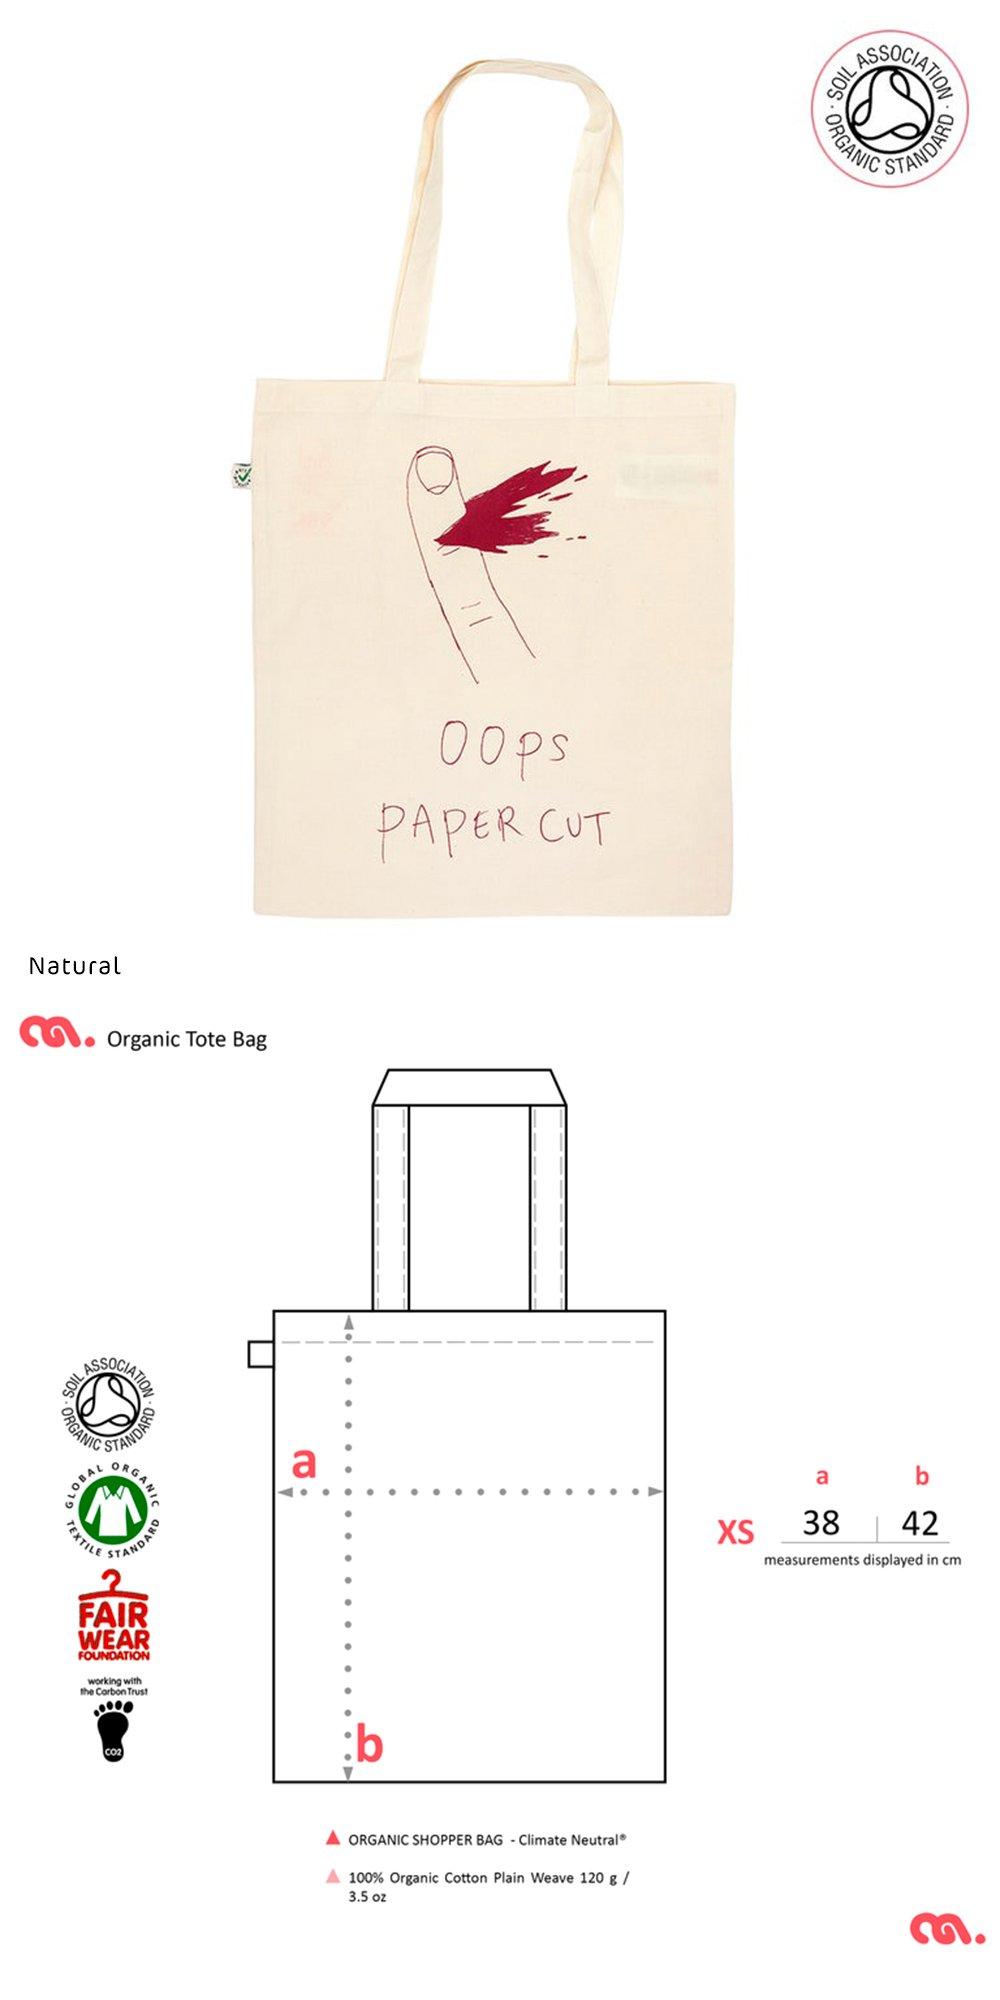 Paper Cut Tote Shopping Bag (Organic)